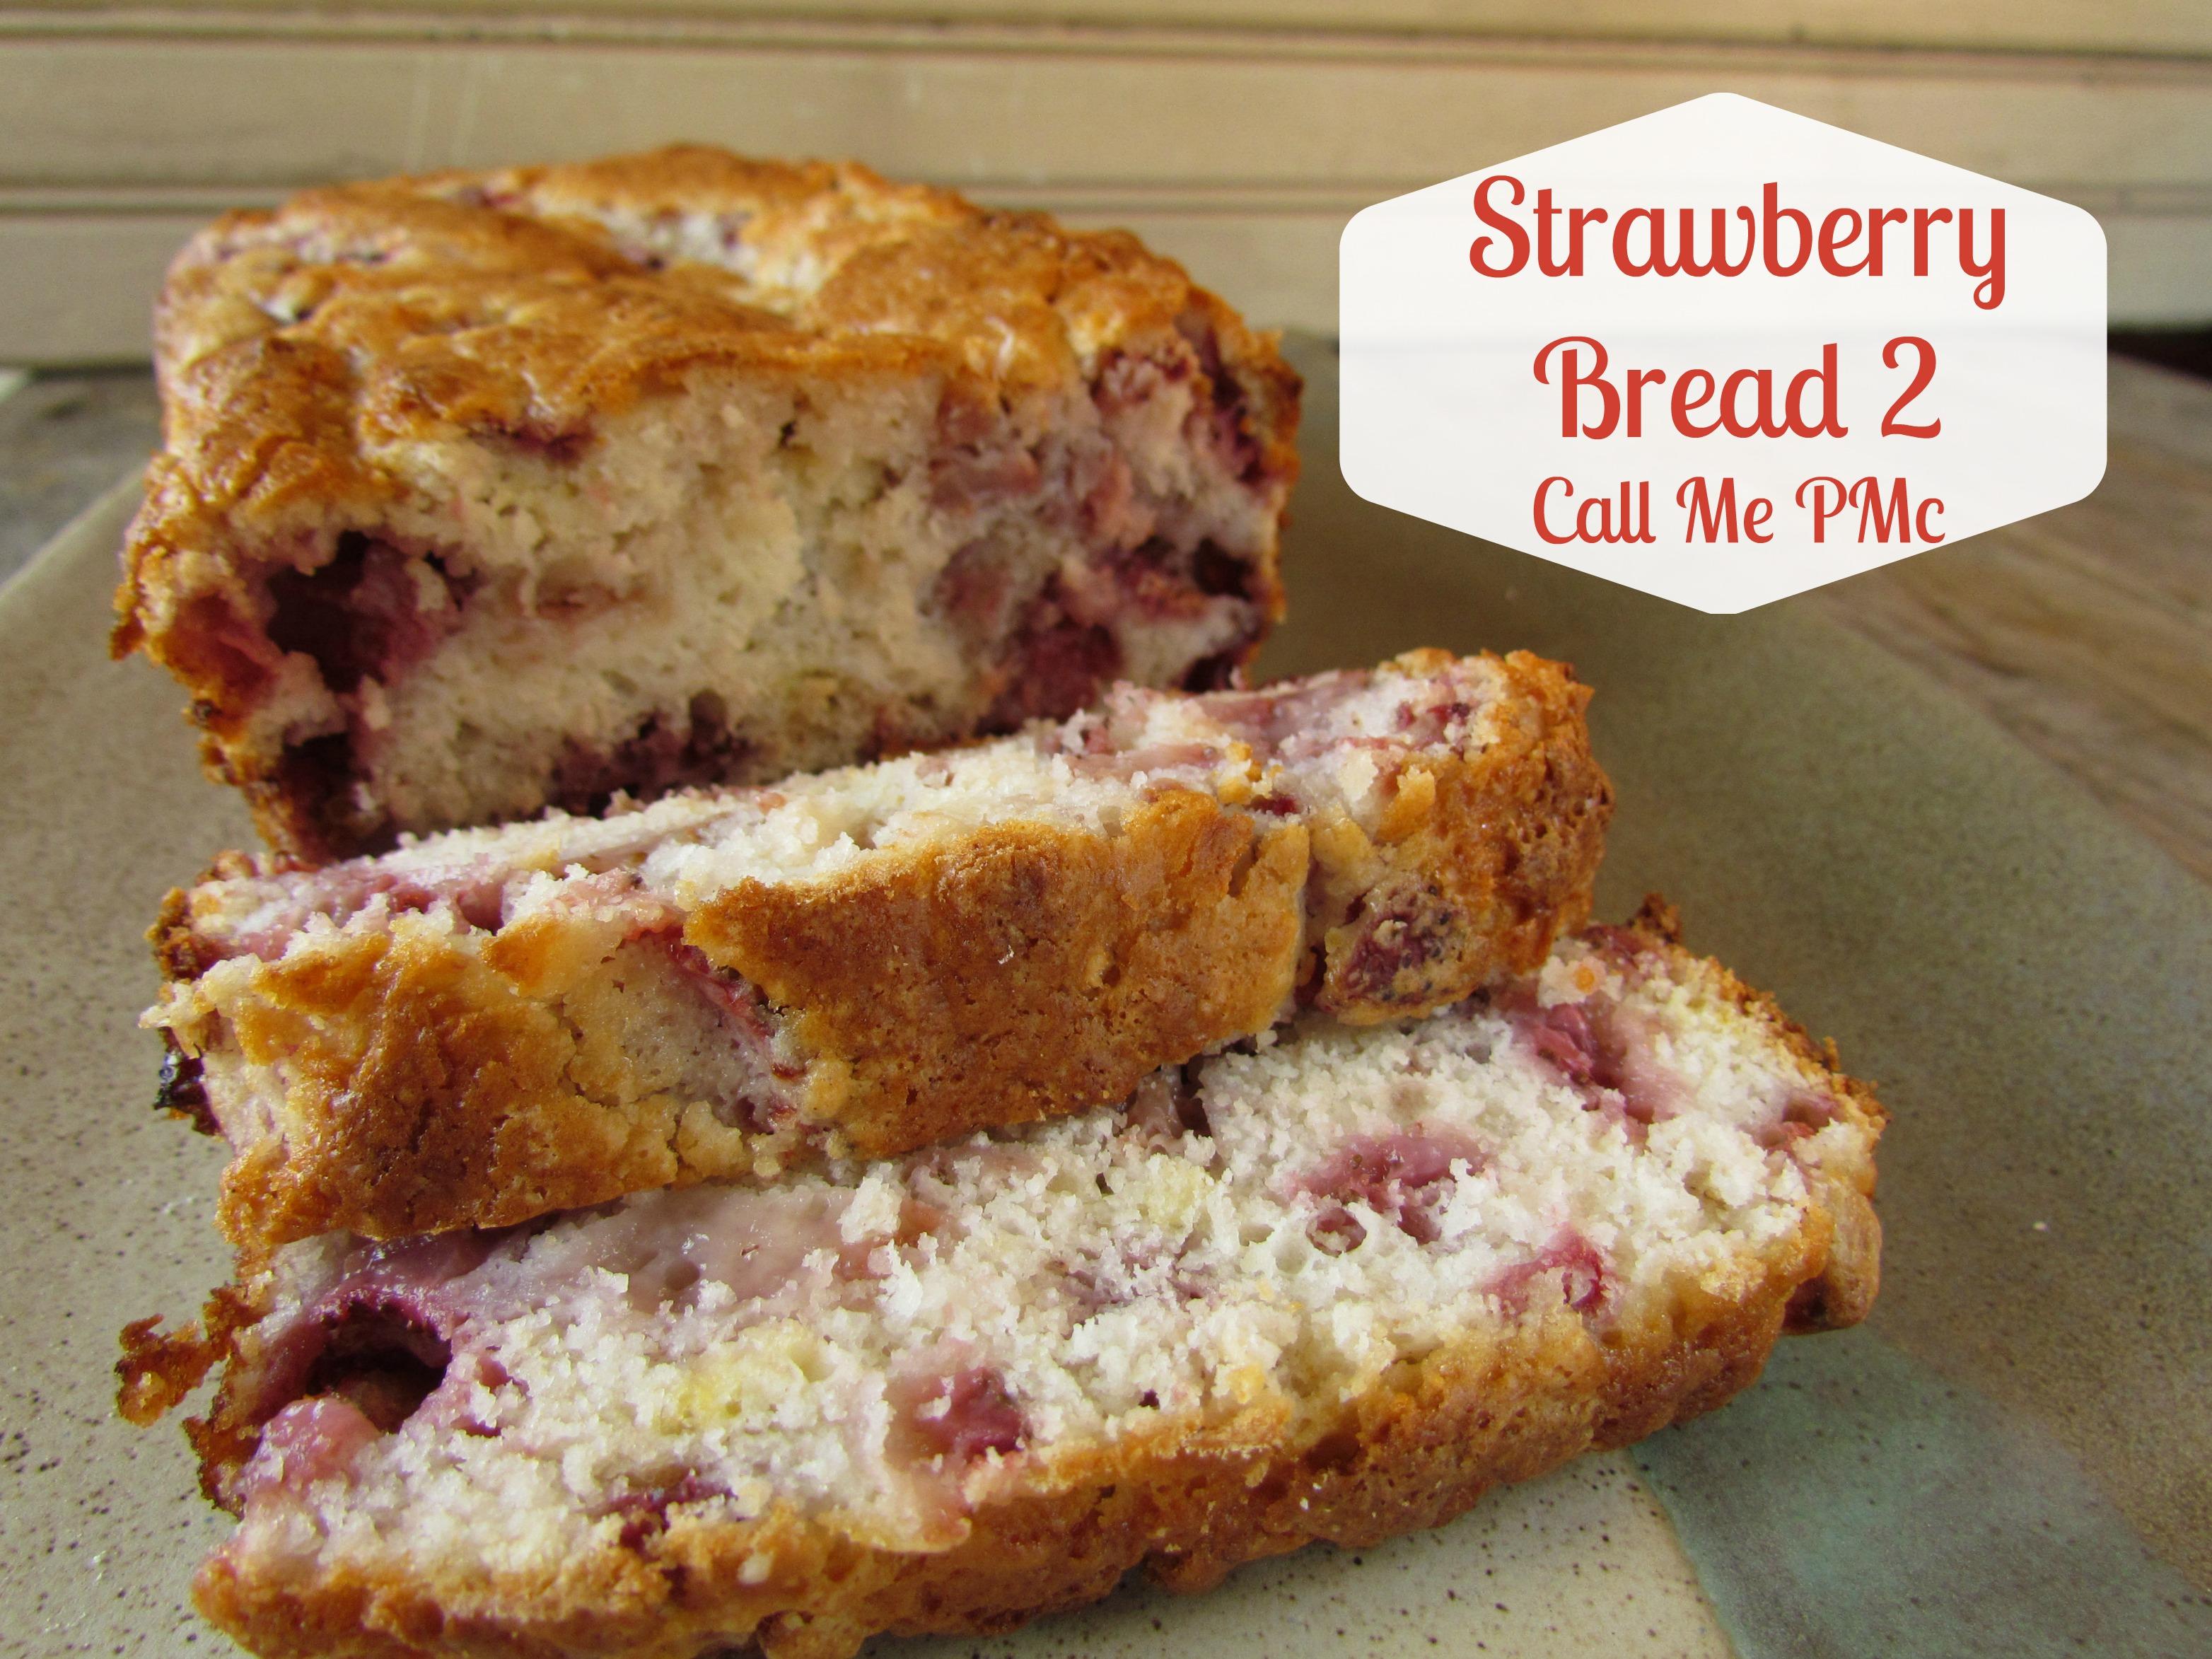 Strawberry Bread II » Call Me PMc